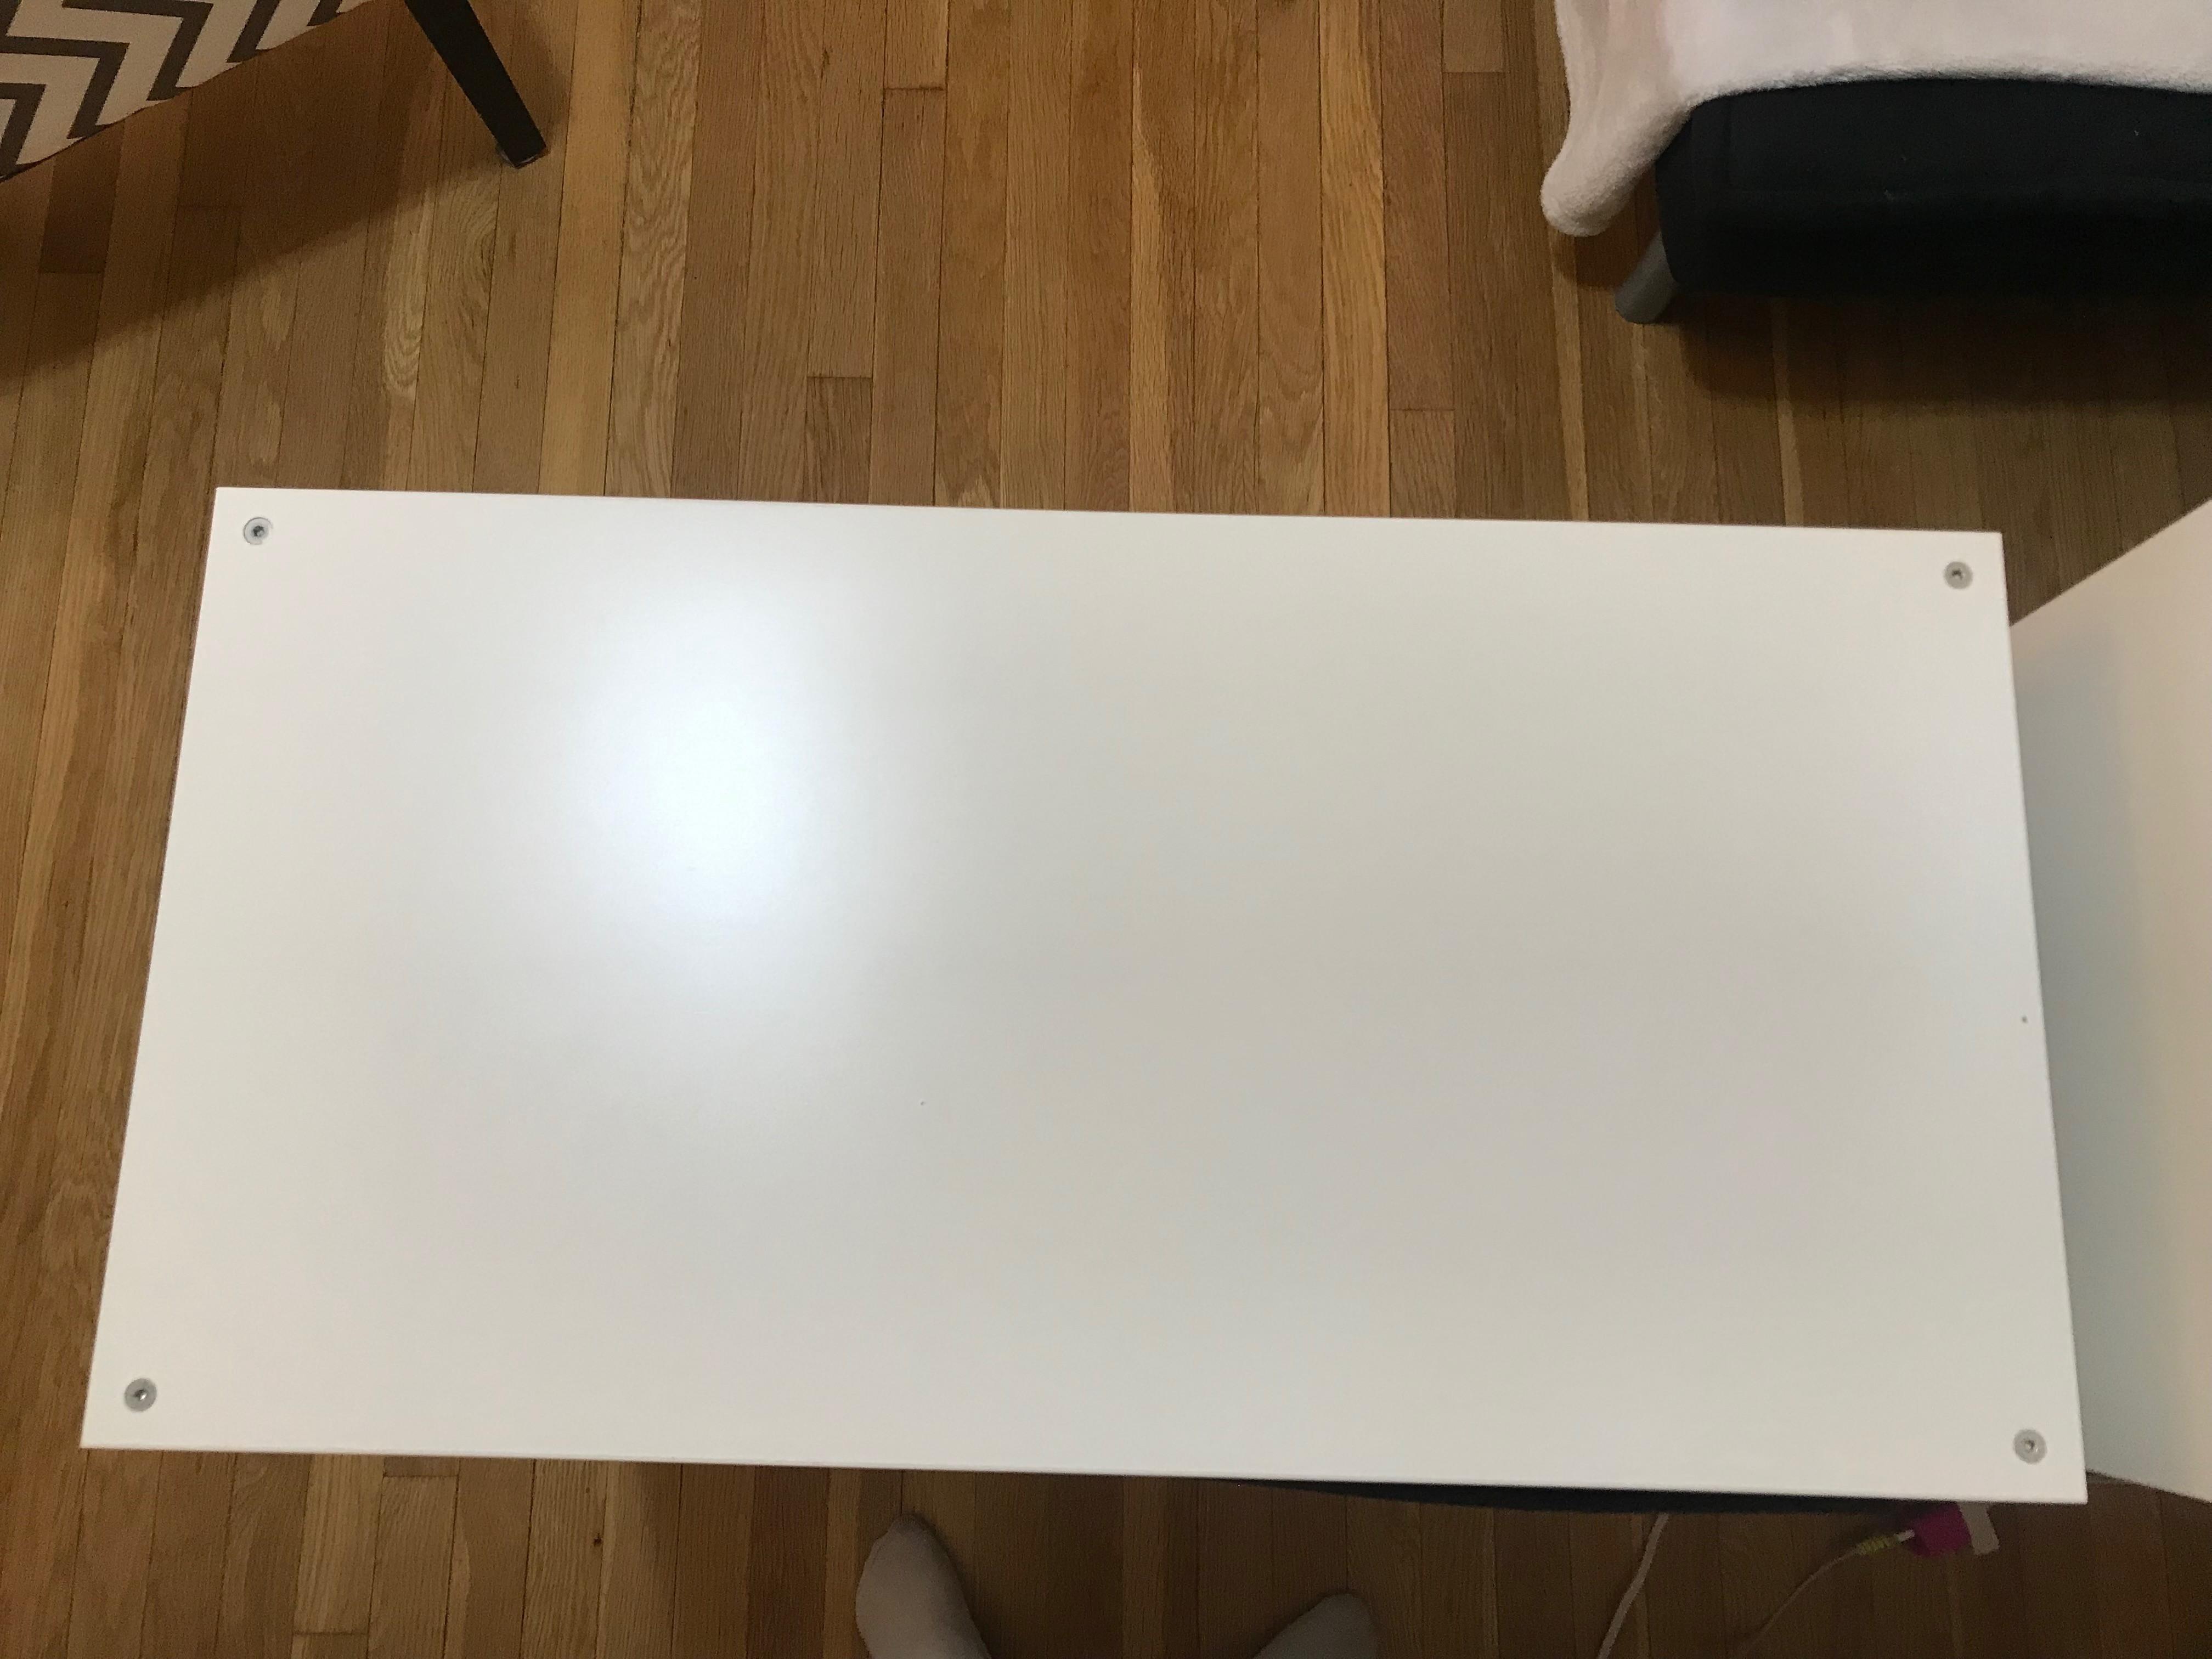 Ikea Kallax White Shelf Unit w/ Inserts